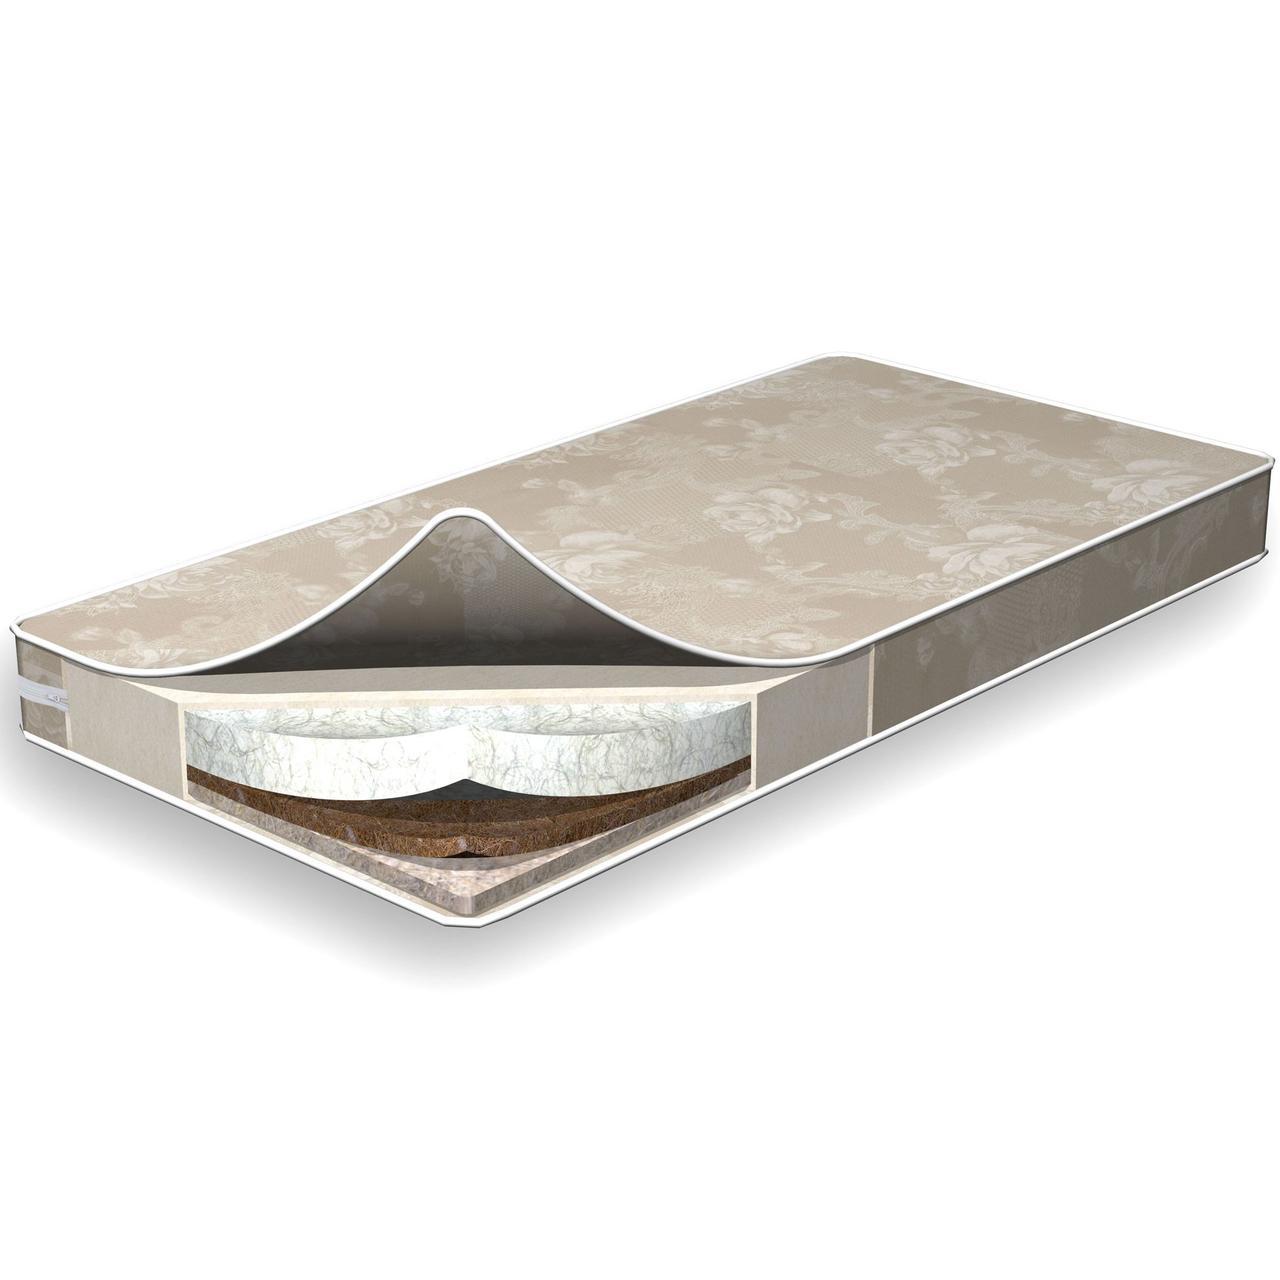 Дитячий матрац Flitex Len-Hollow-Coconut 60х120х12 см (FT10.2.09)